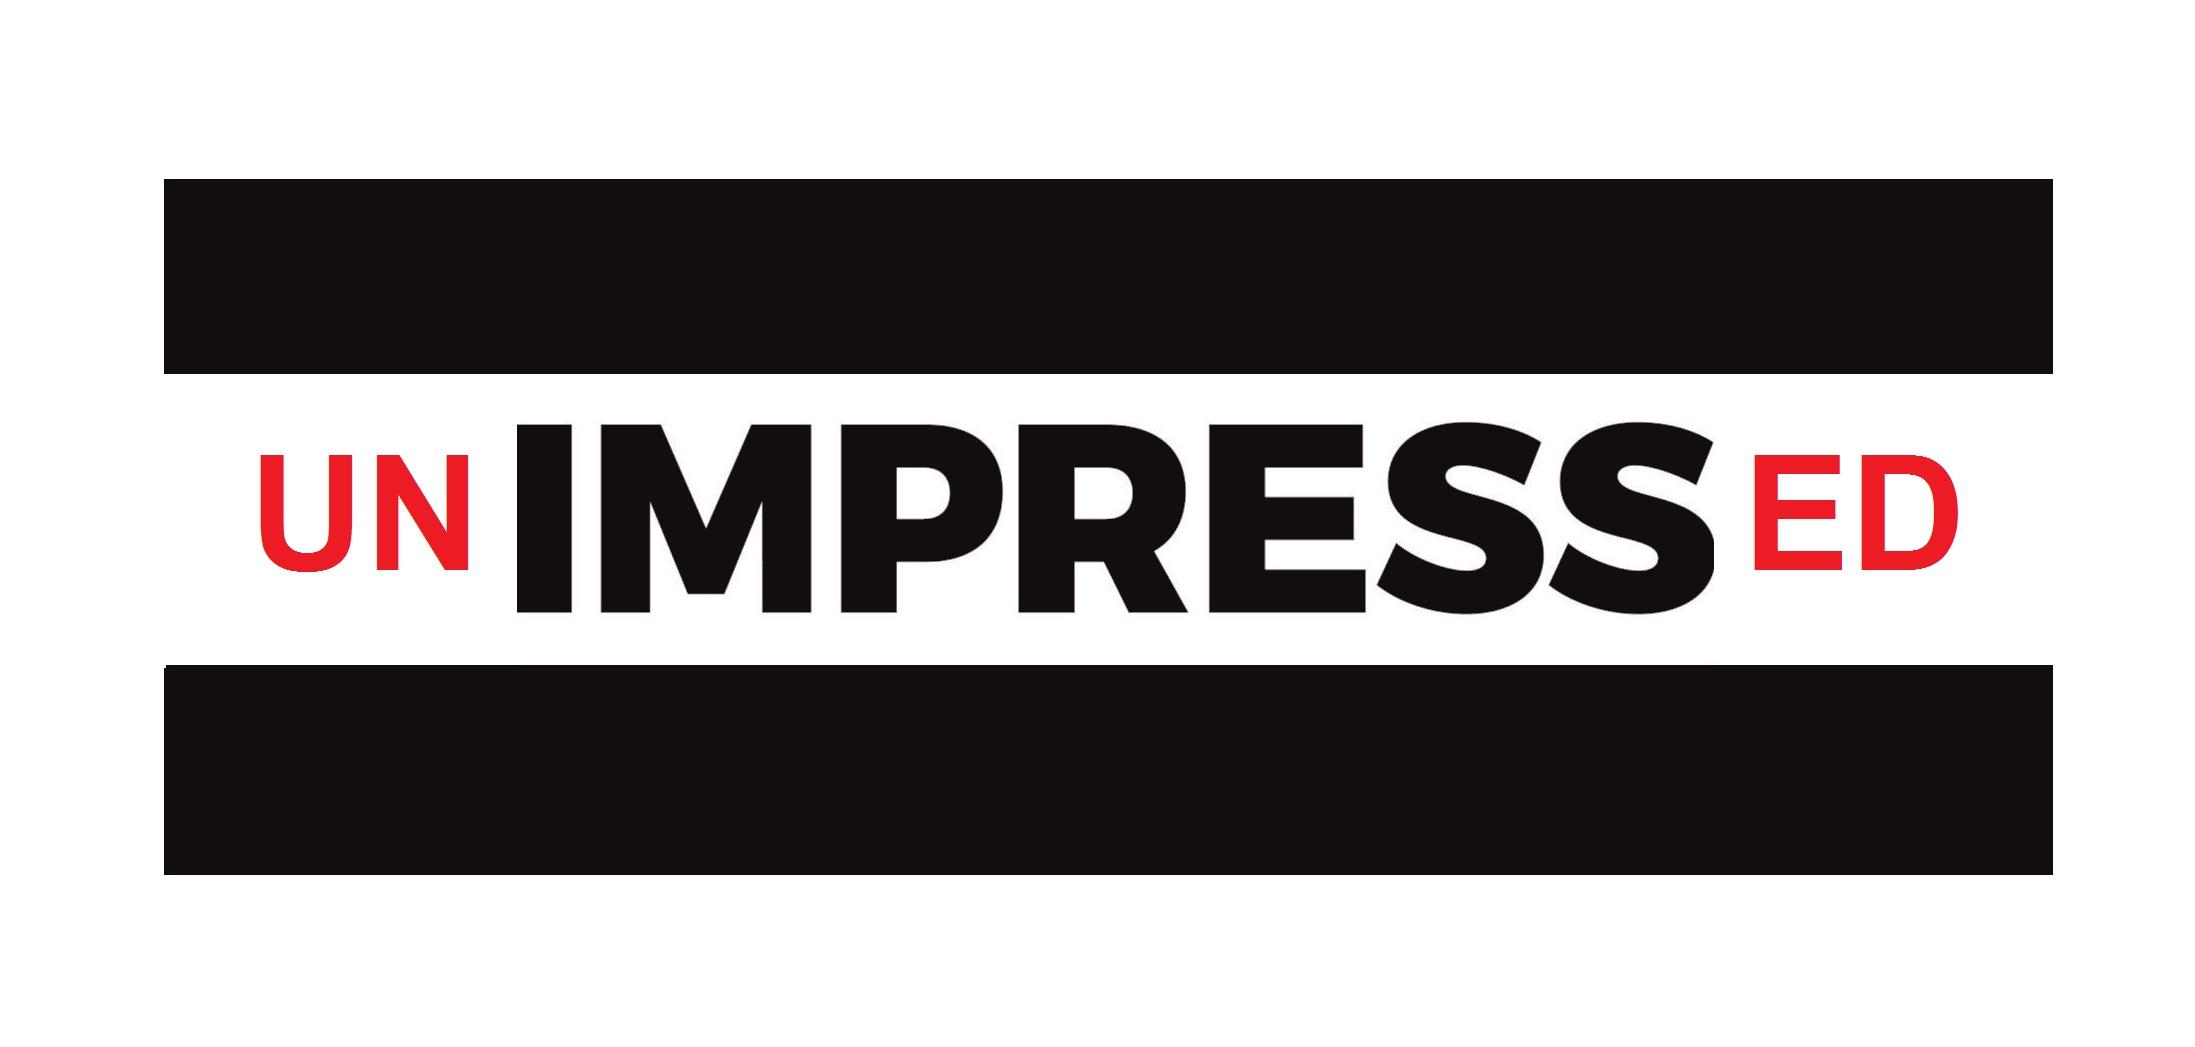 unimpressed-impress-max-mosley